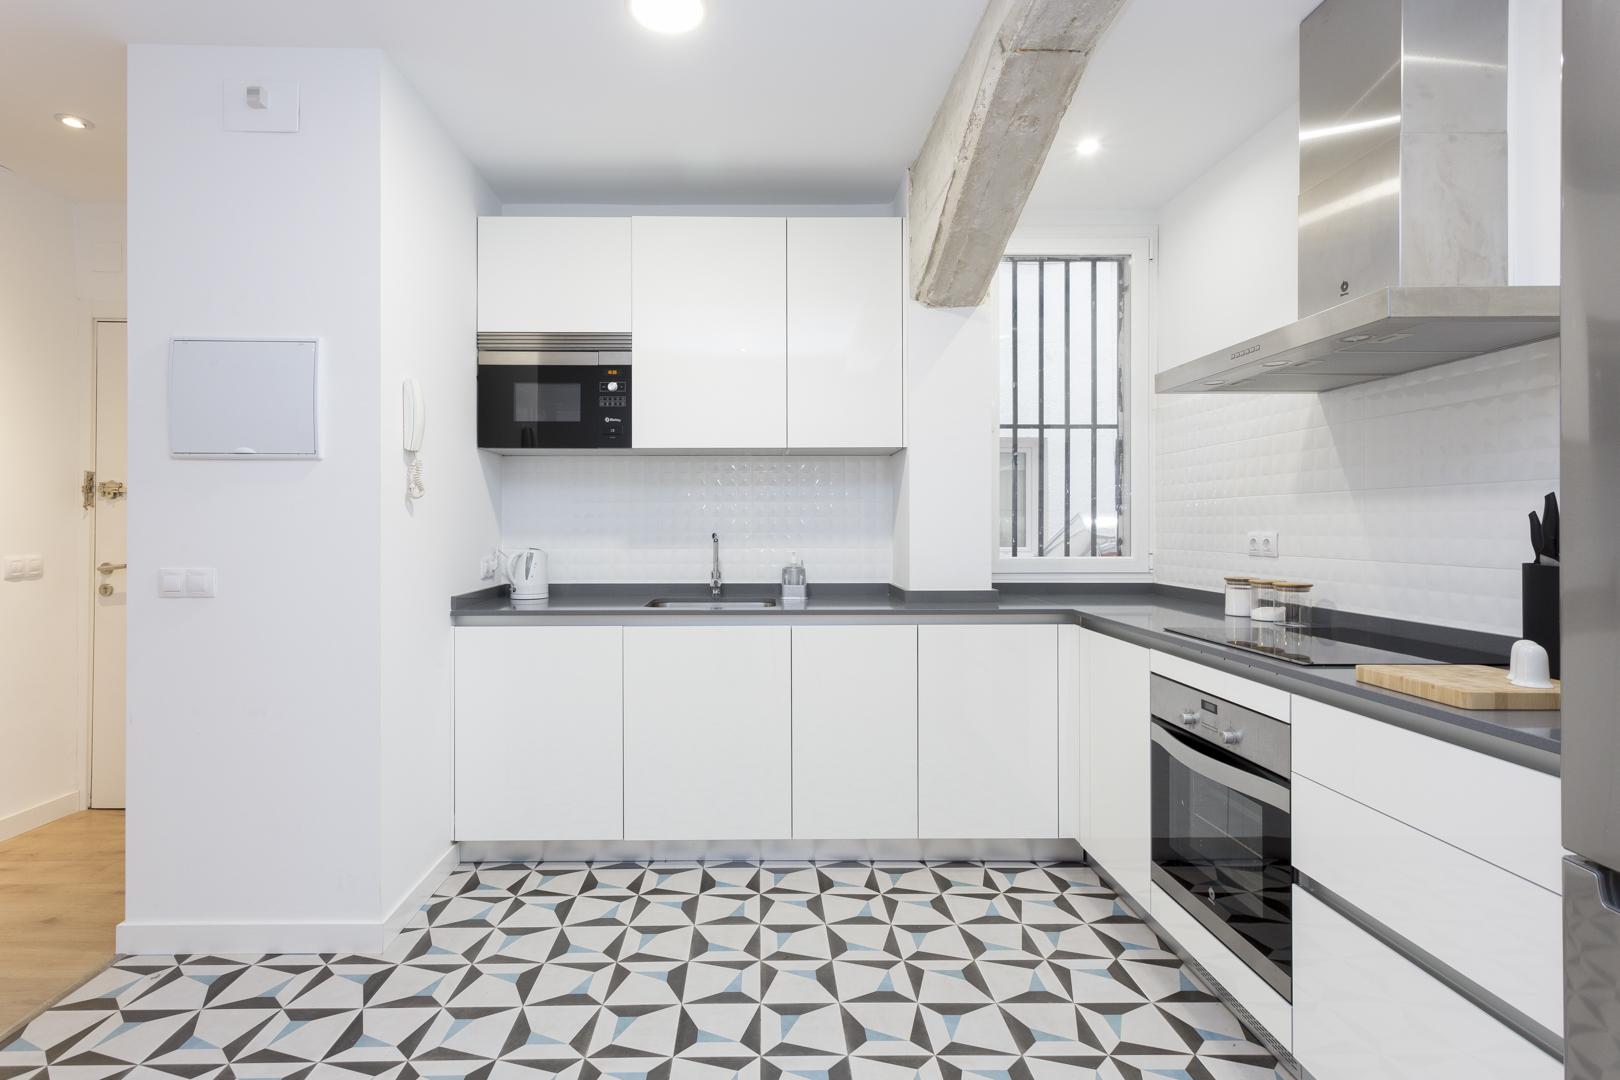 Tiles at Calle Gravina Apartment, Centre, Madrid